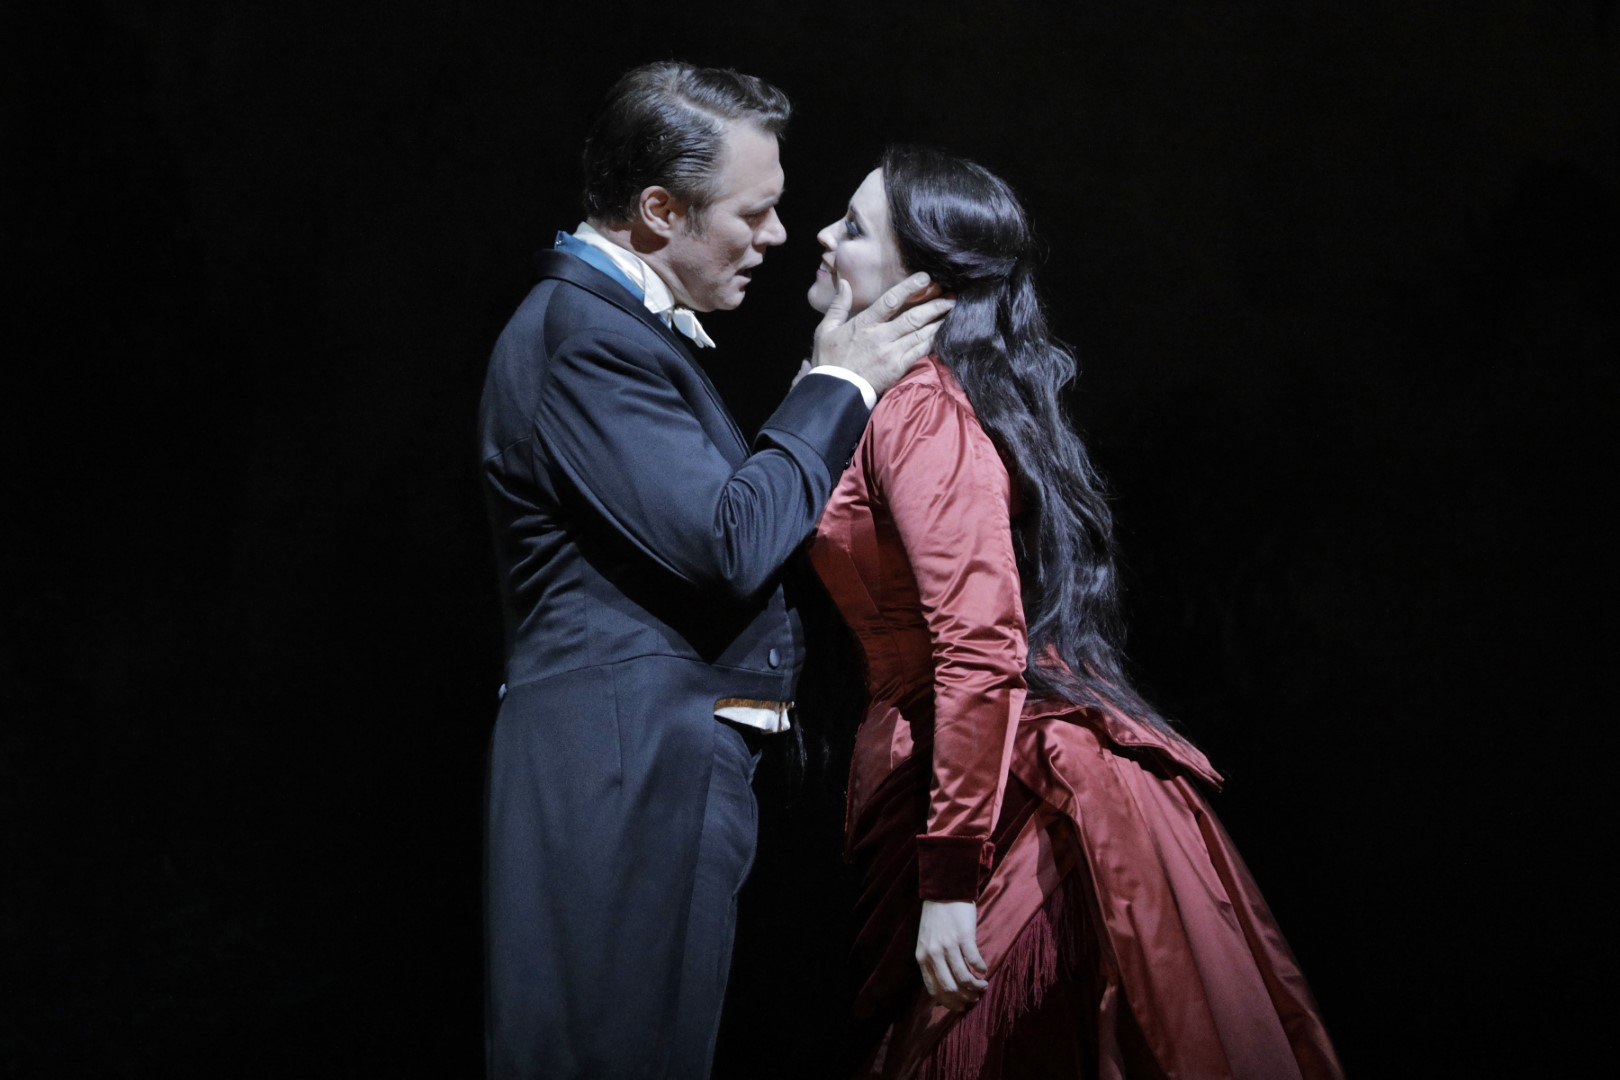 Rachel Willis-Sørensen as Rusalka, Brandon Jovanovich as the Prince